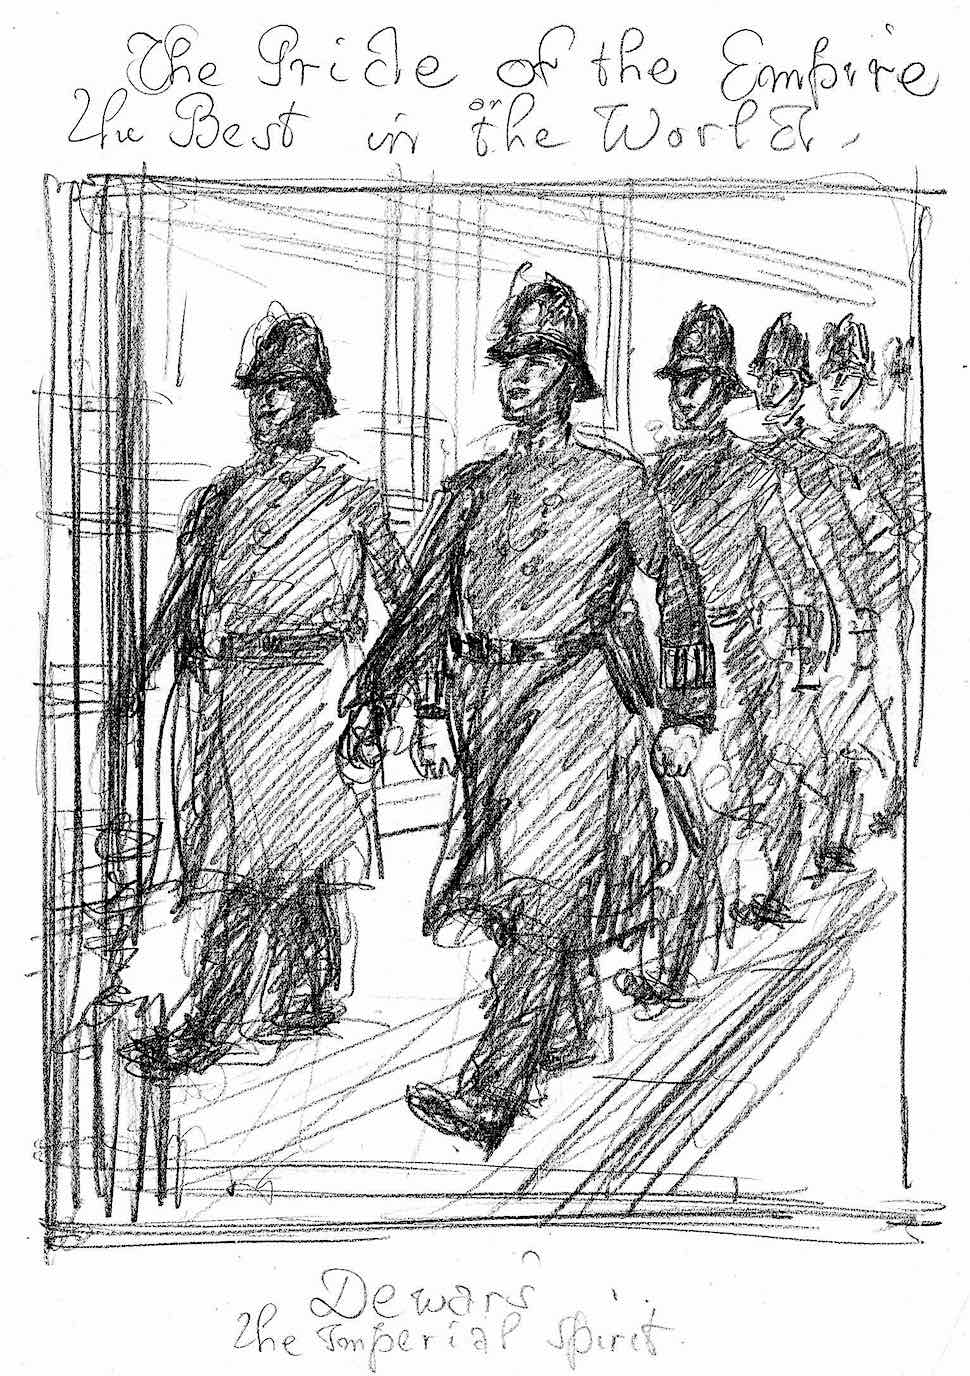 an Edmund J. Sullivan illustration sketch of policemen for a British whiskey advertisement